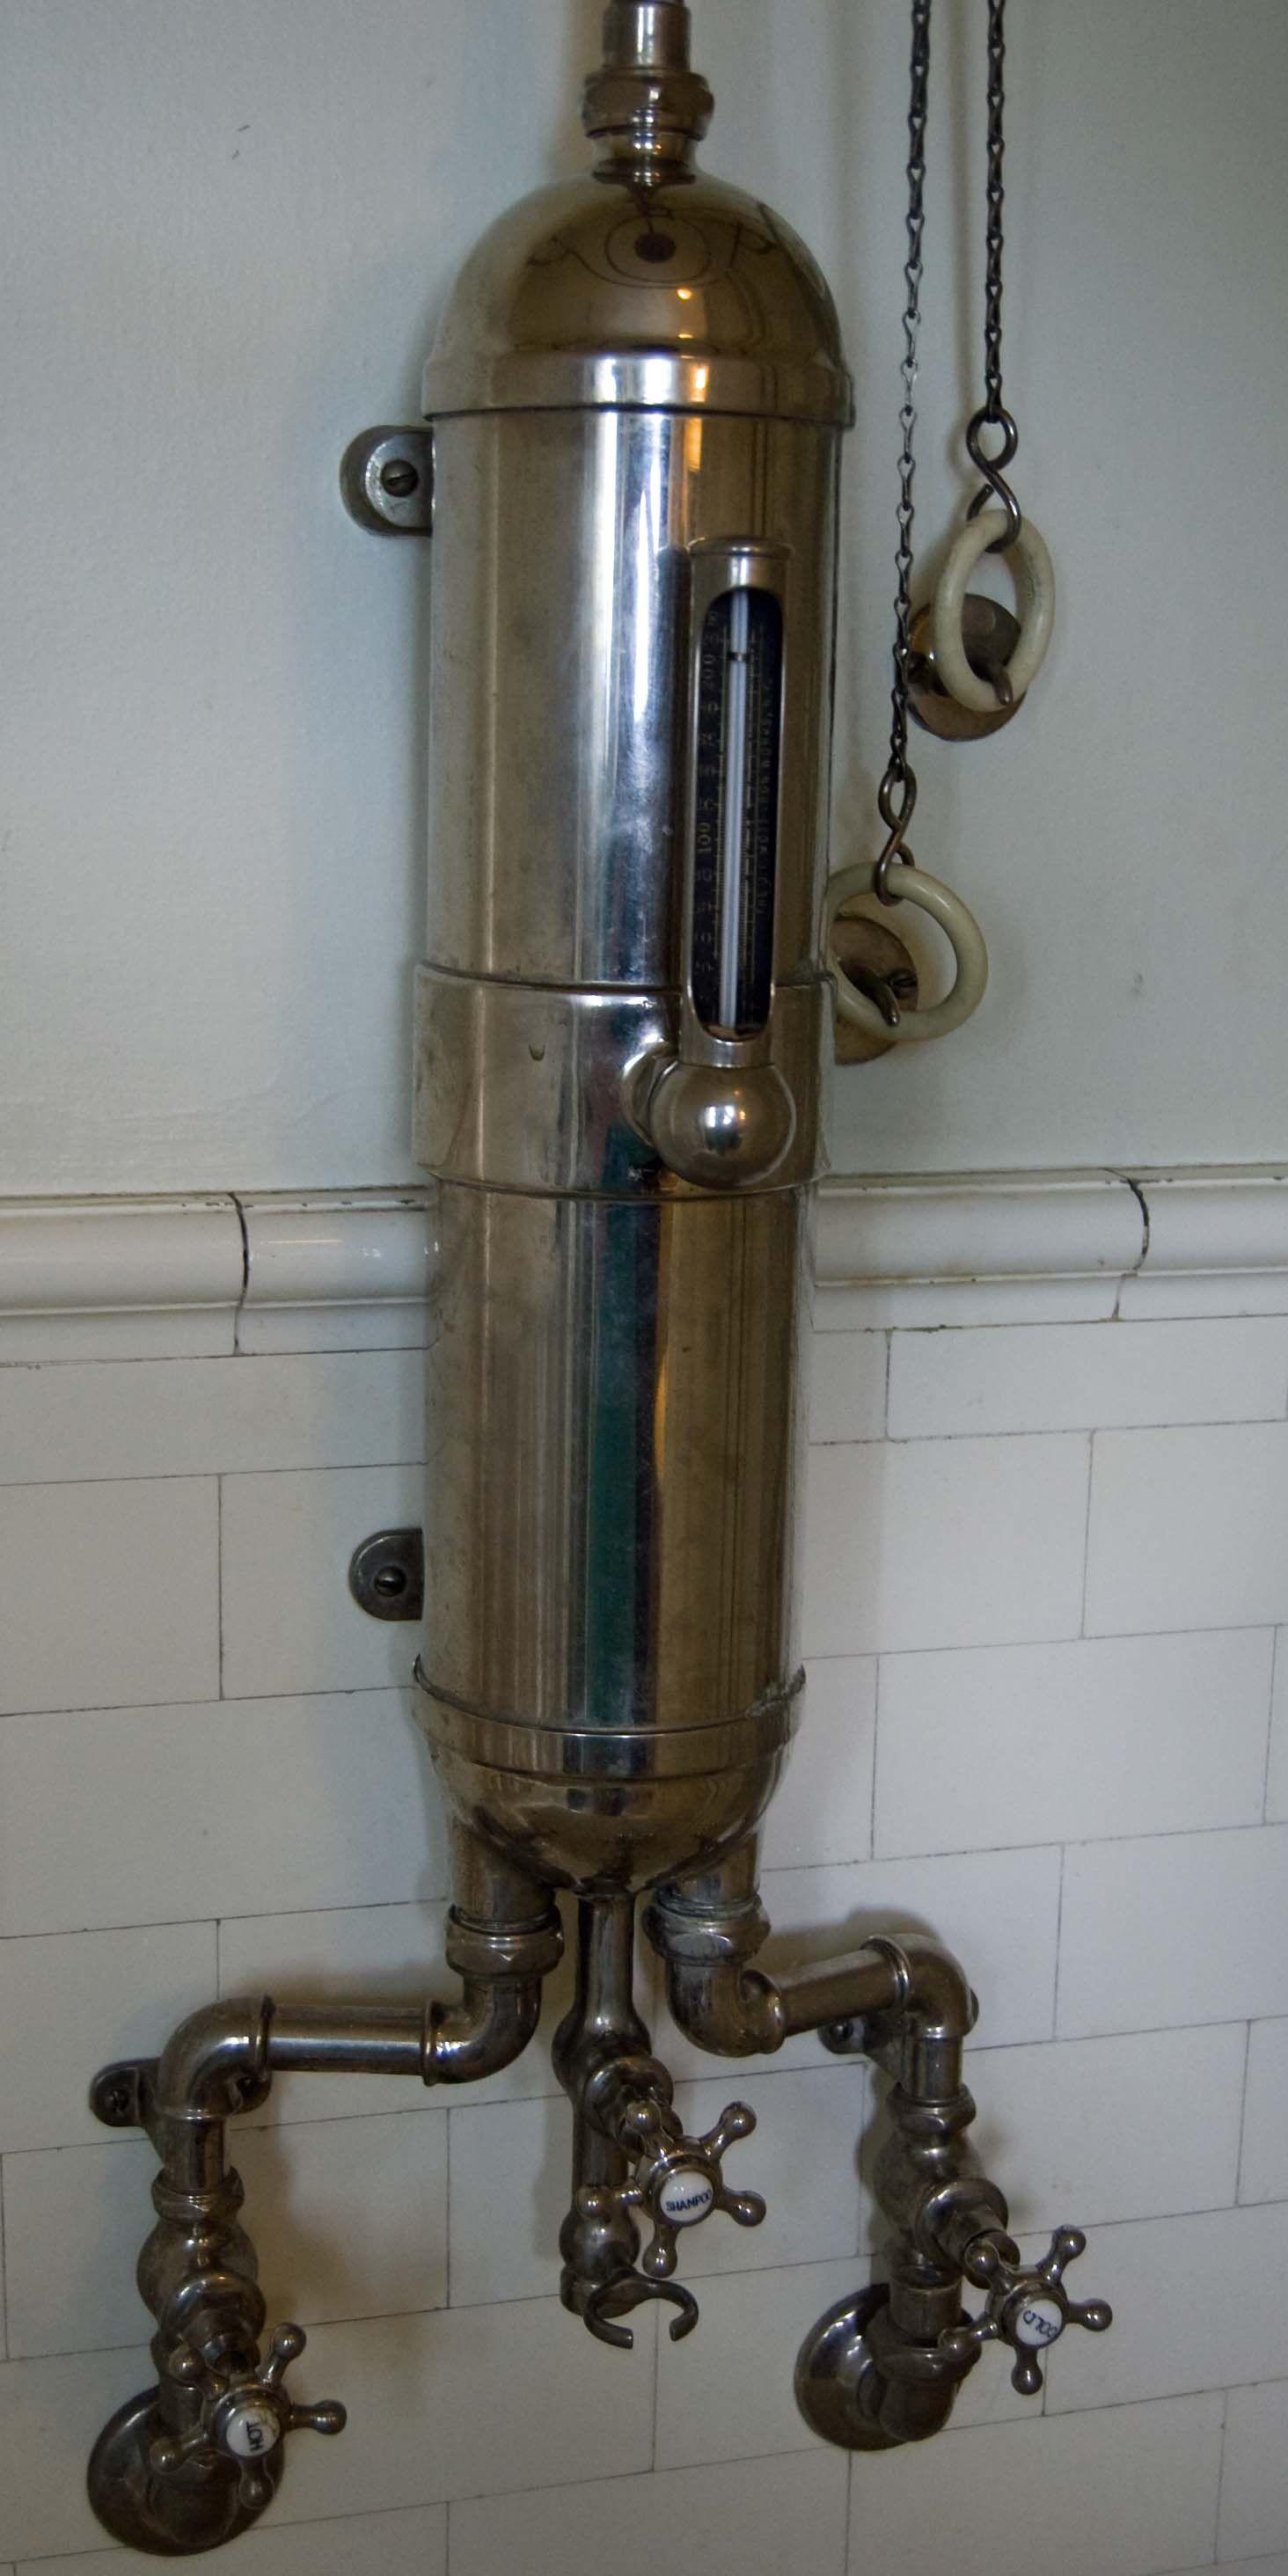 Vintage Plumbing Can You Imagine Plumbing Can Be Pretty Victorian Bathroom Plumbing Vintage